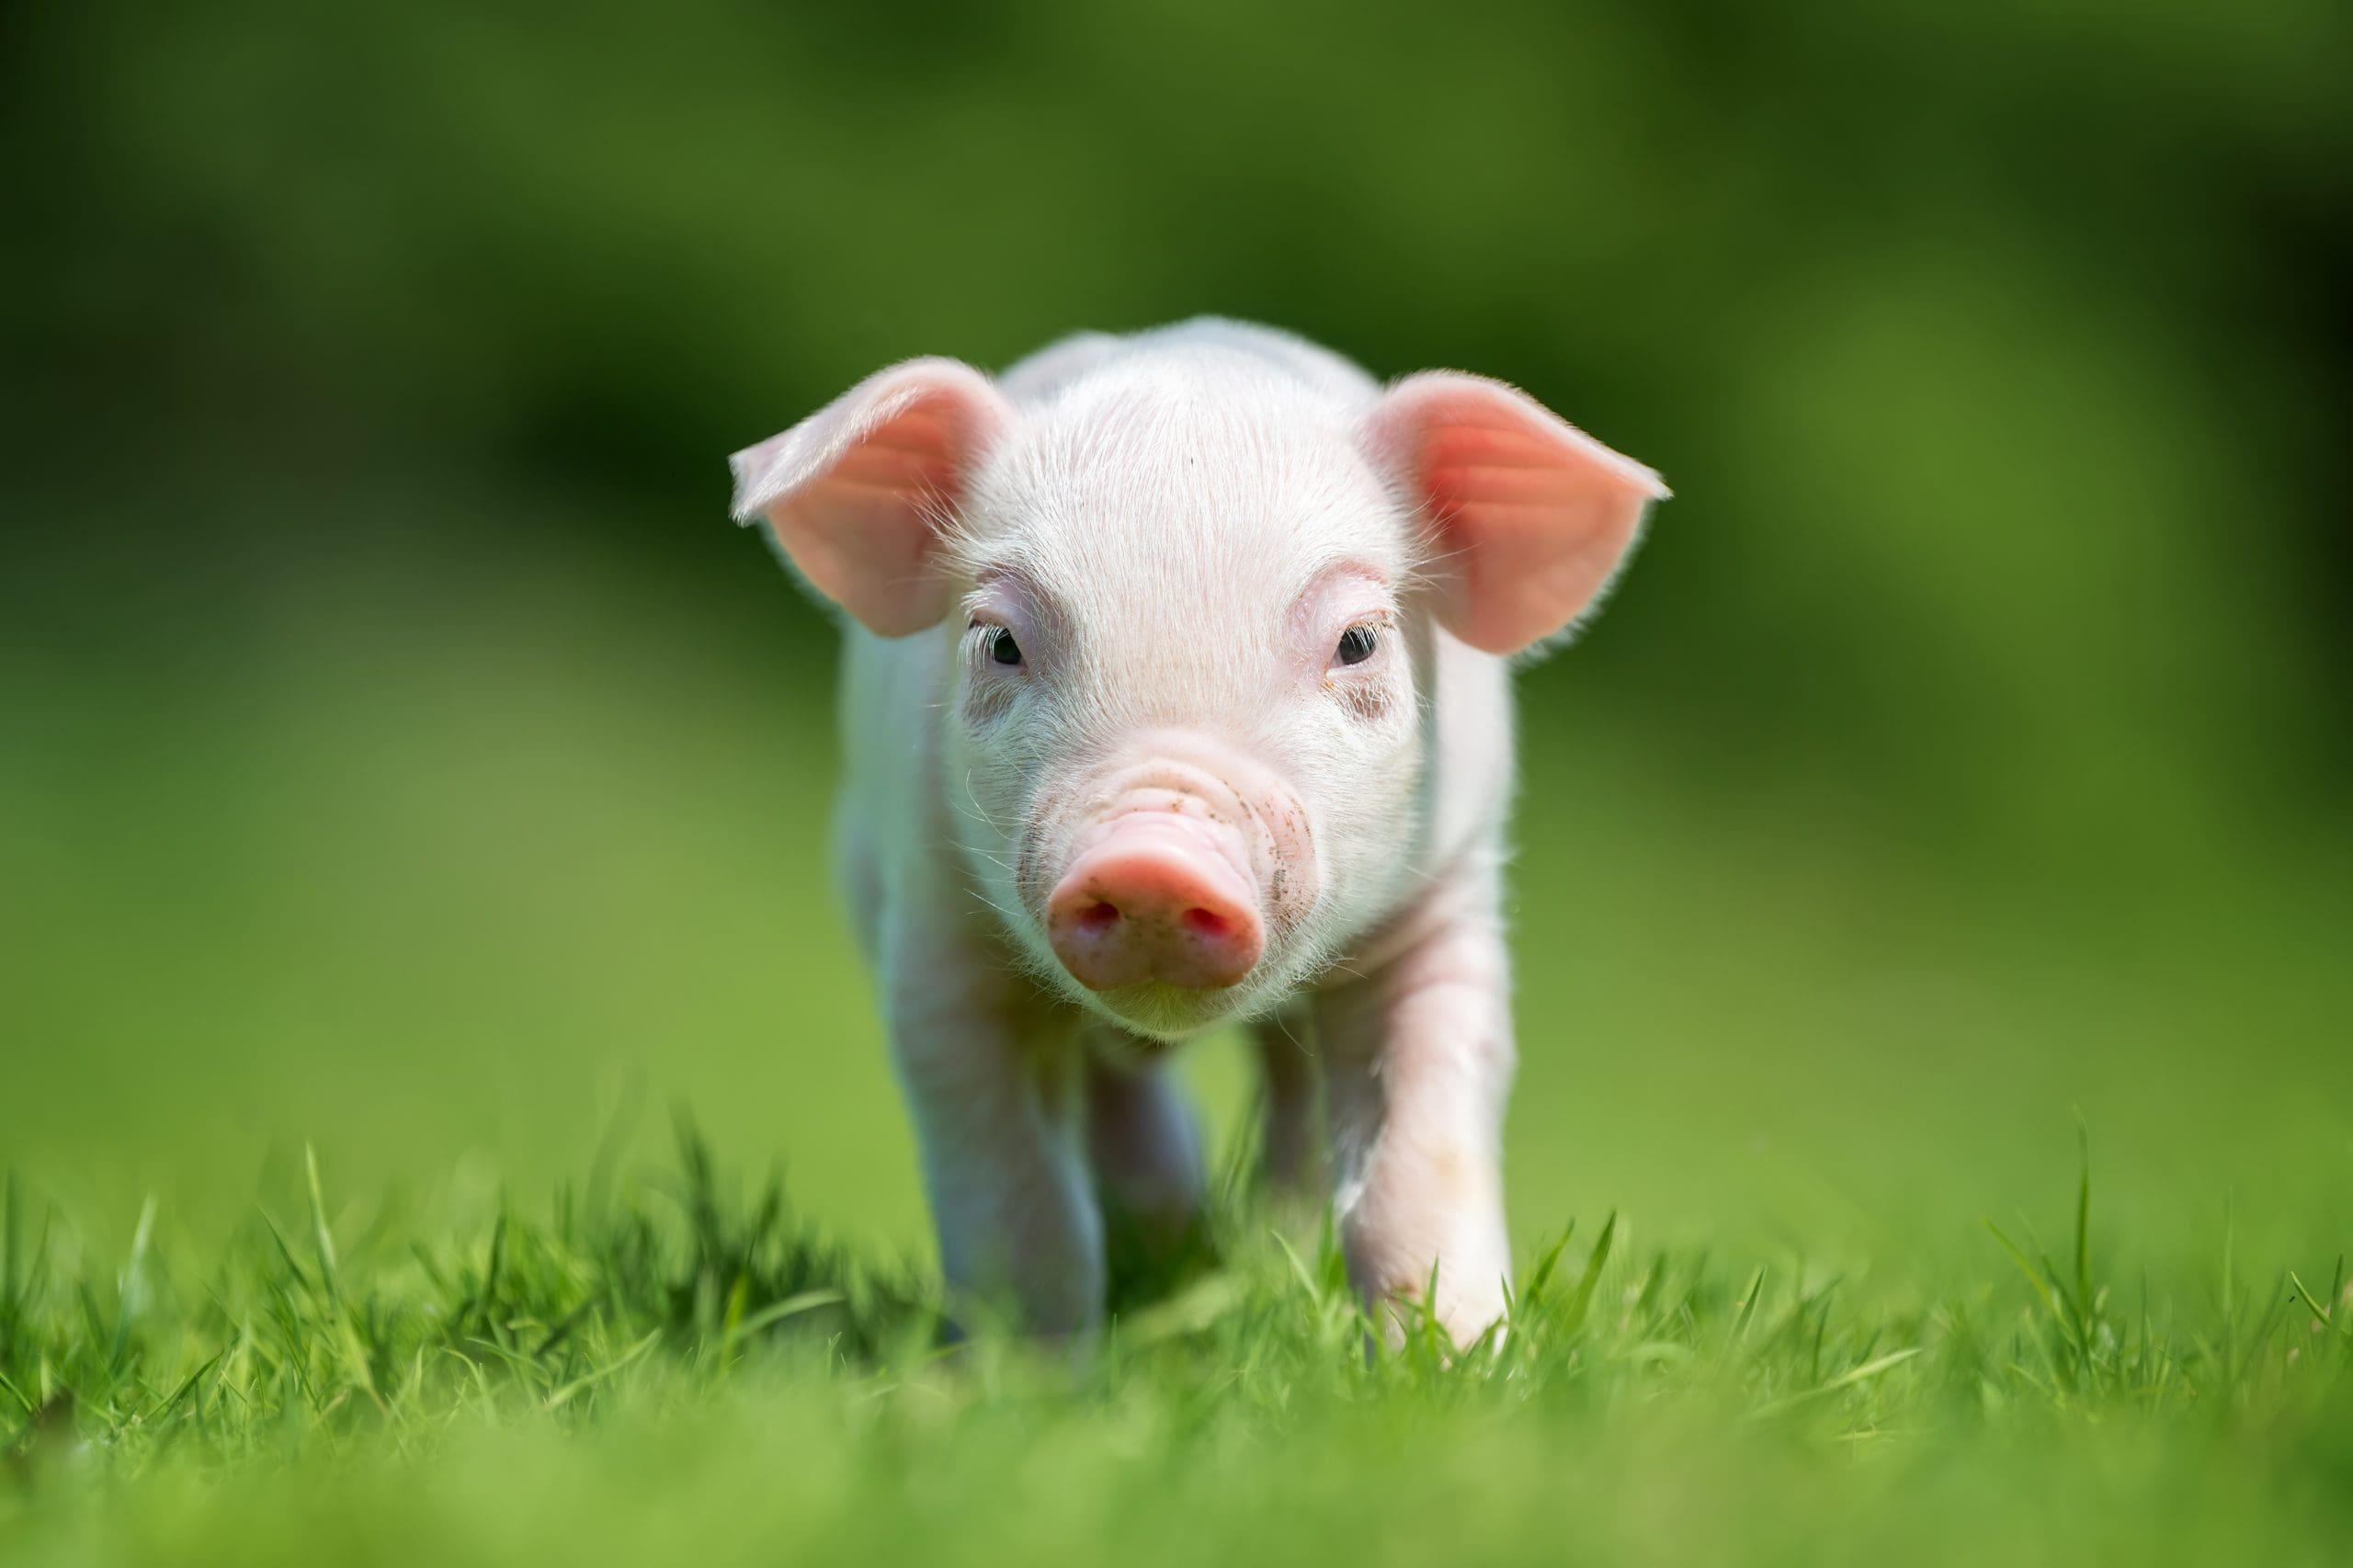 newborn-piglet-on-spring-green-grass-JP63VHZ-scaled-min.jpg